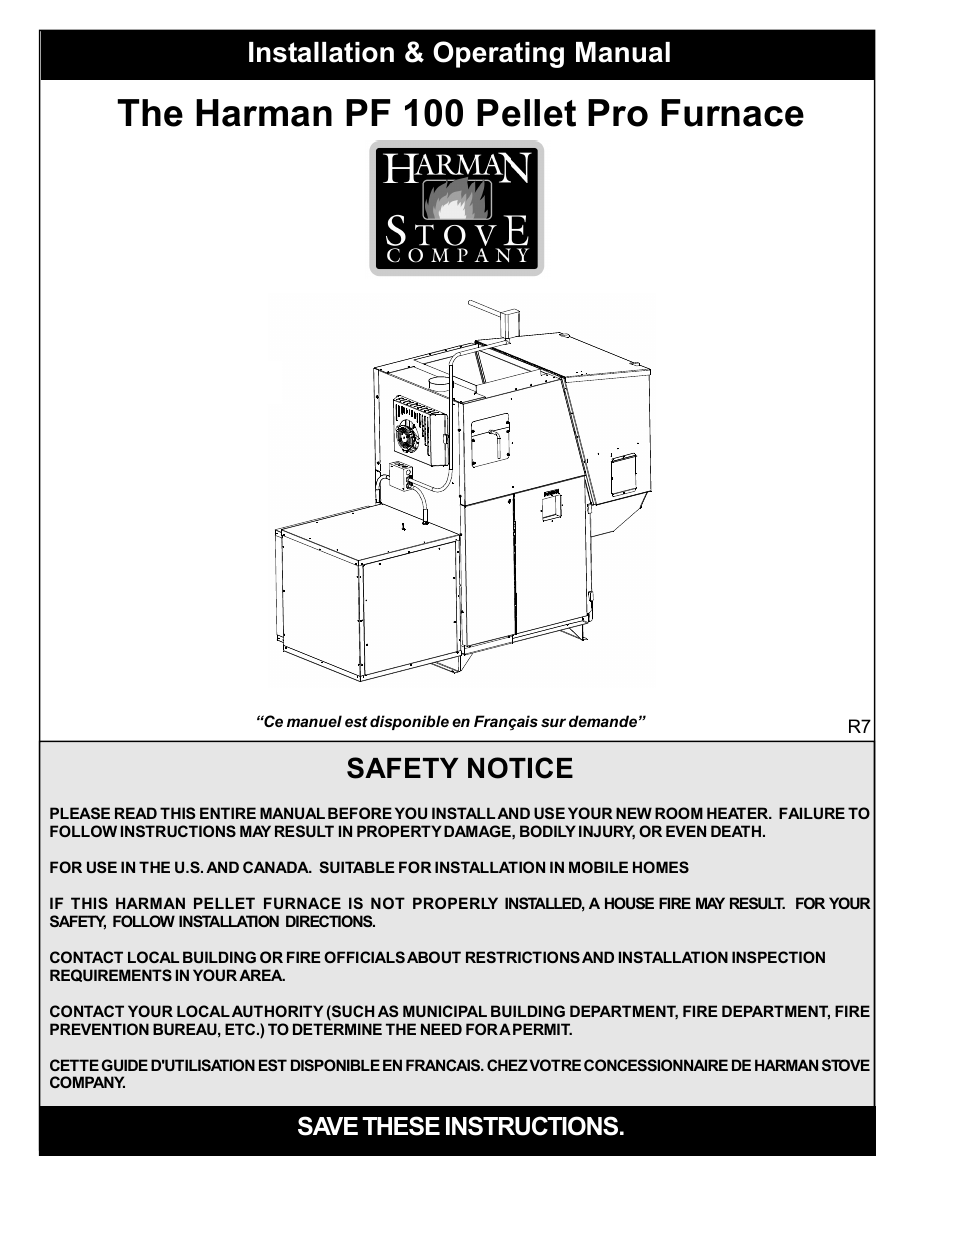 Harman Stove Company Pf 100 User Manual